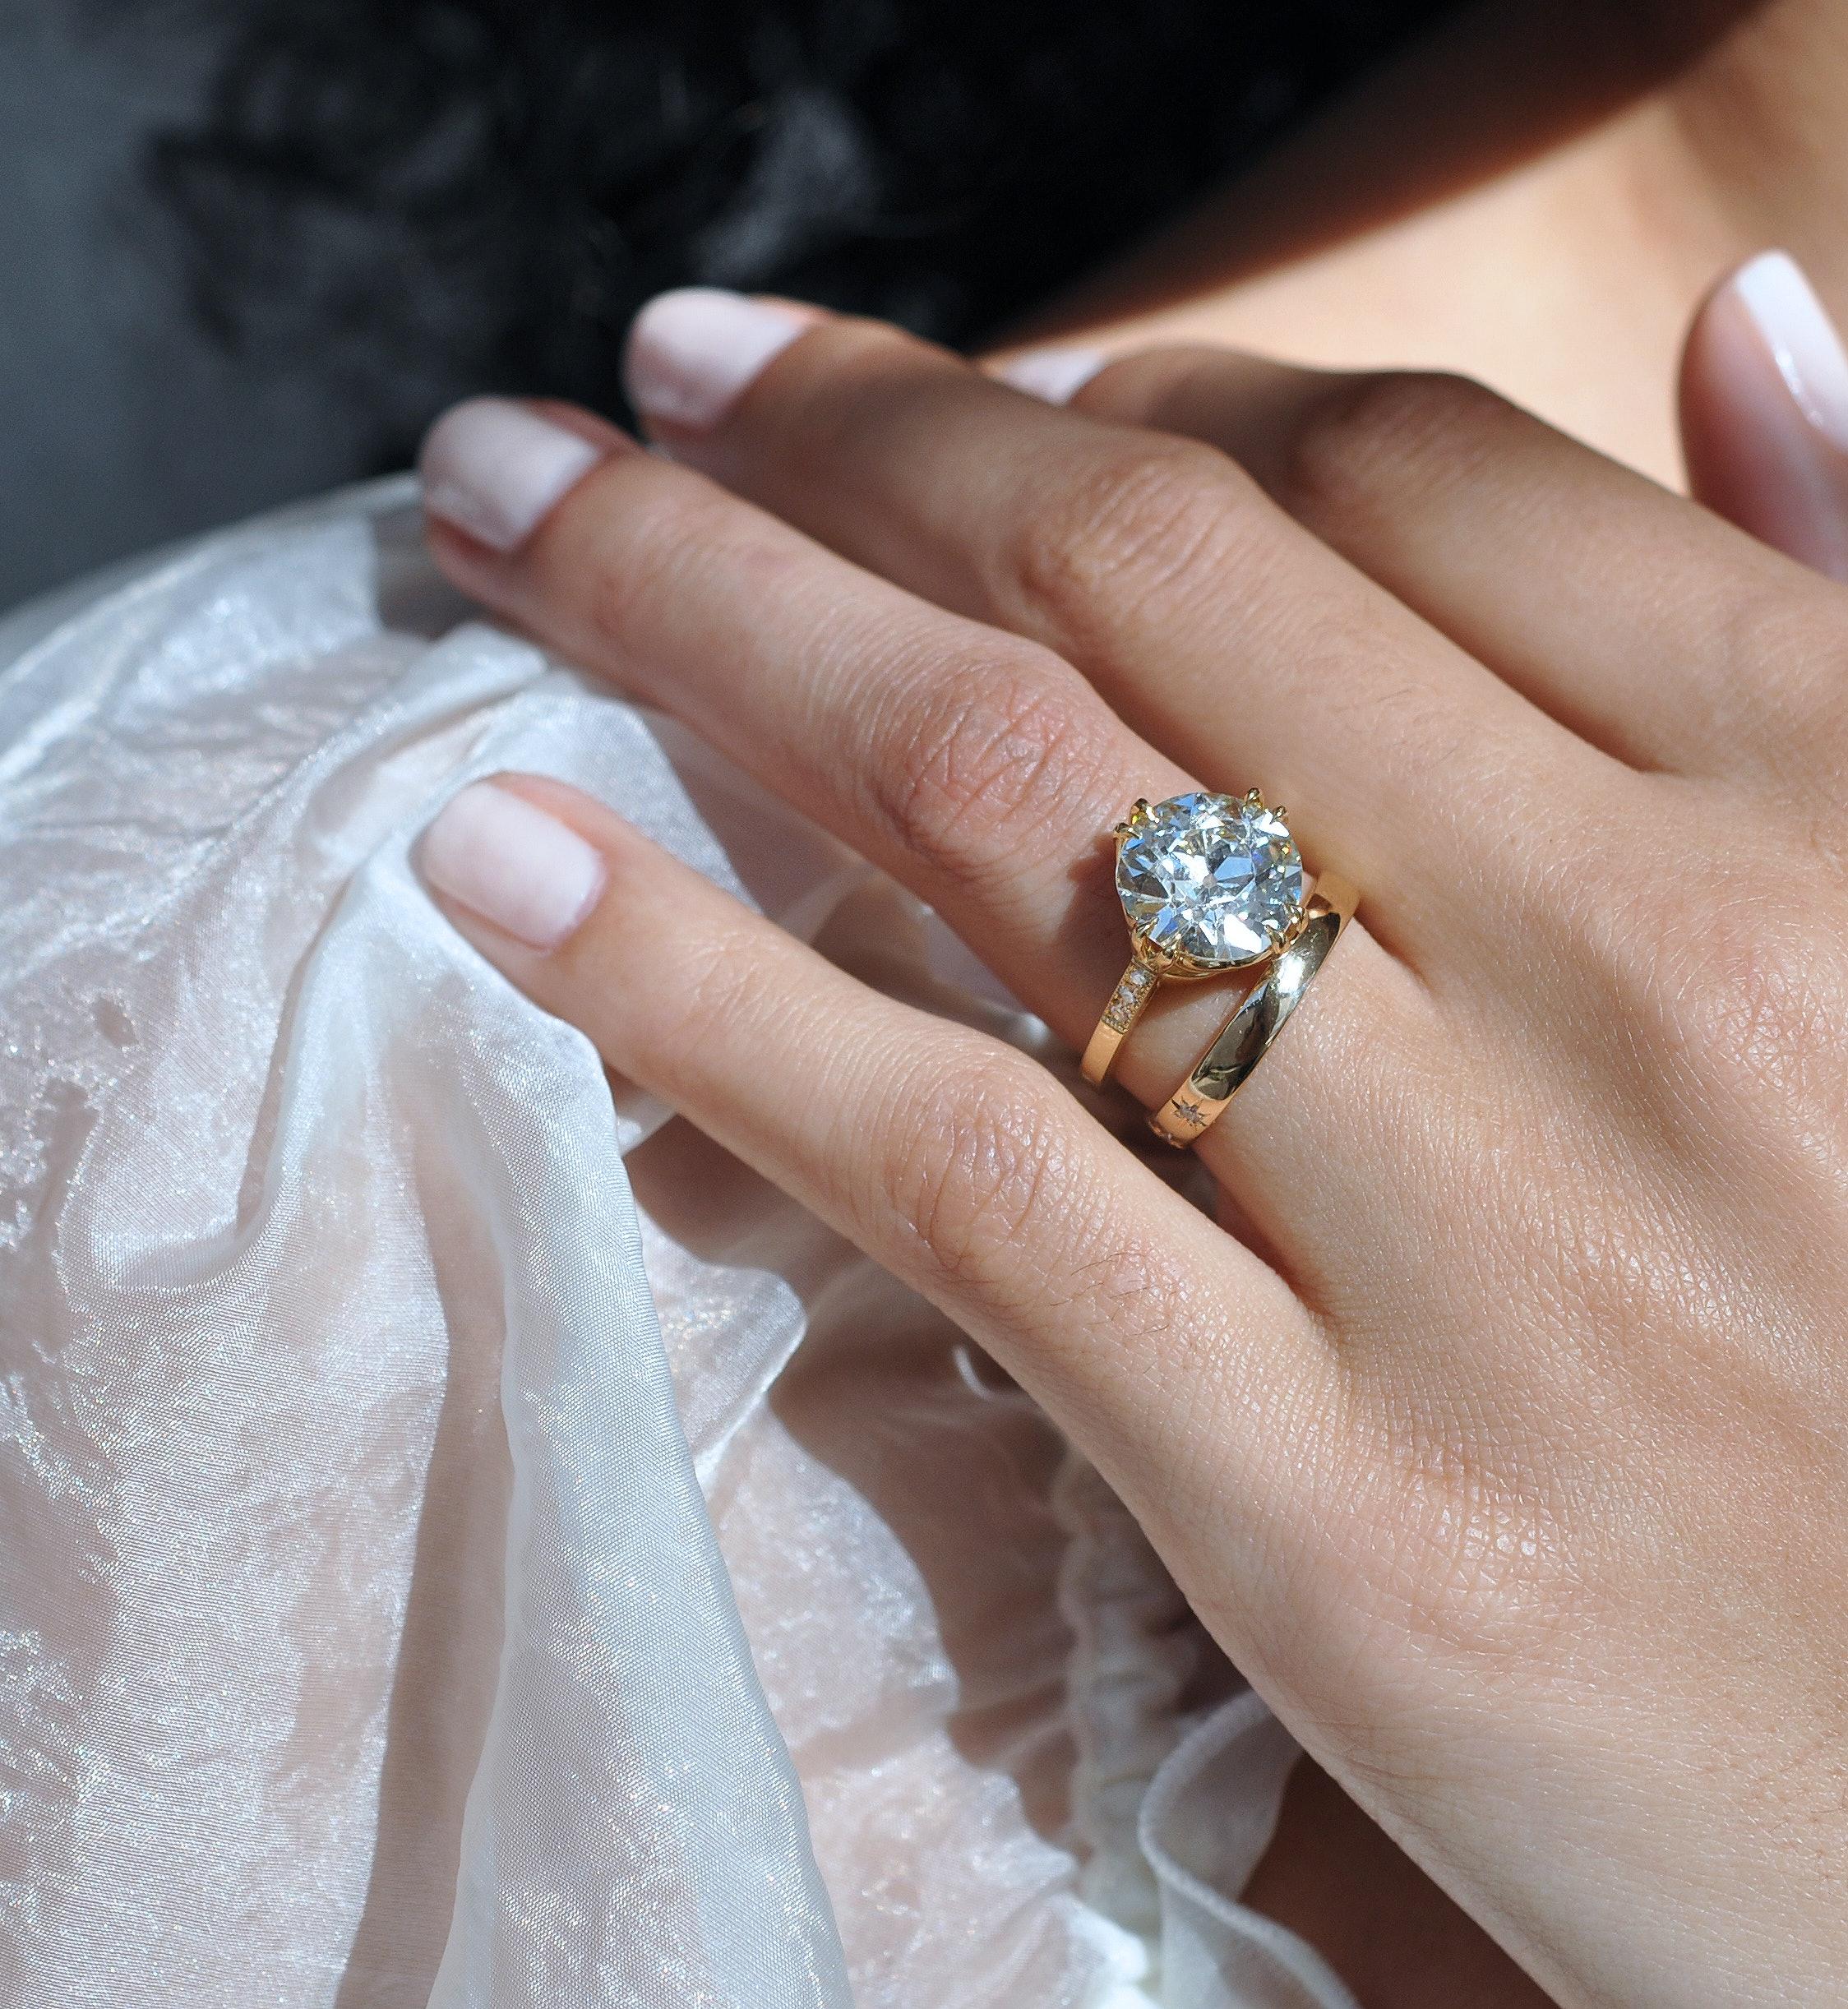 Vintage 14k White Gold Single Cut Diamond Wedding Band Ring Unique Unusual